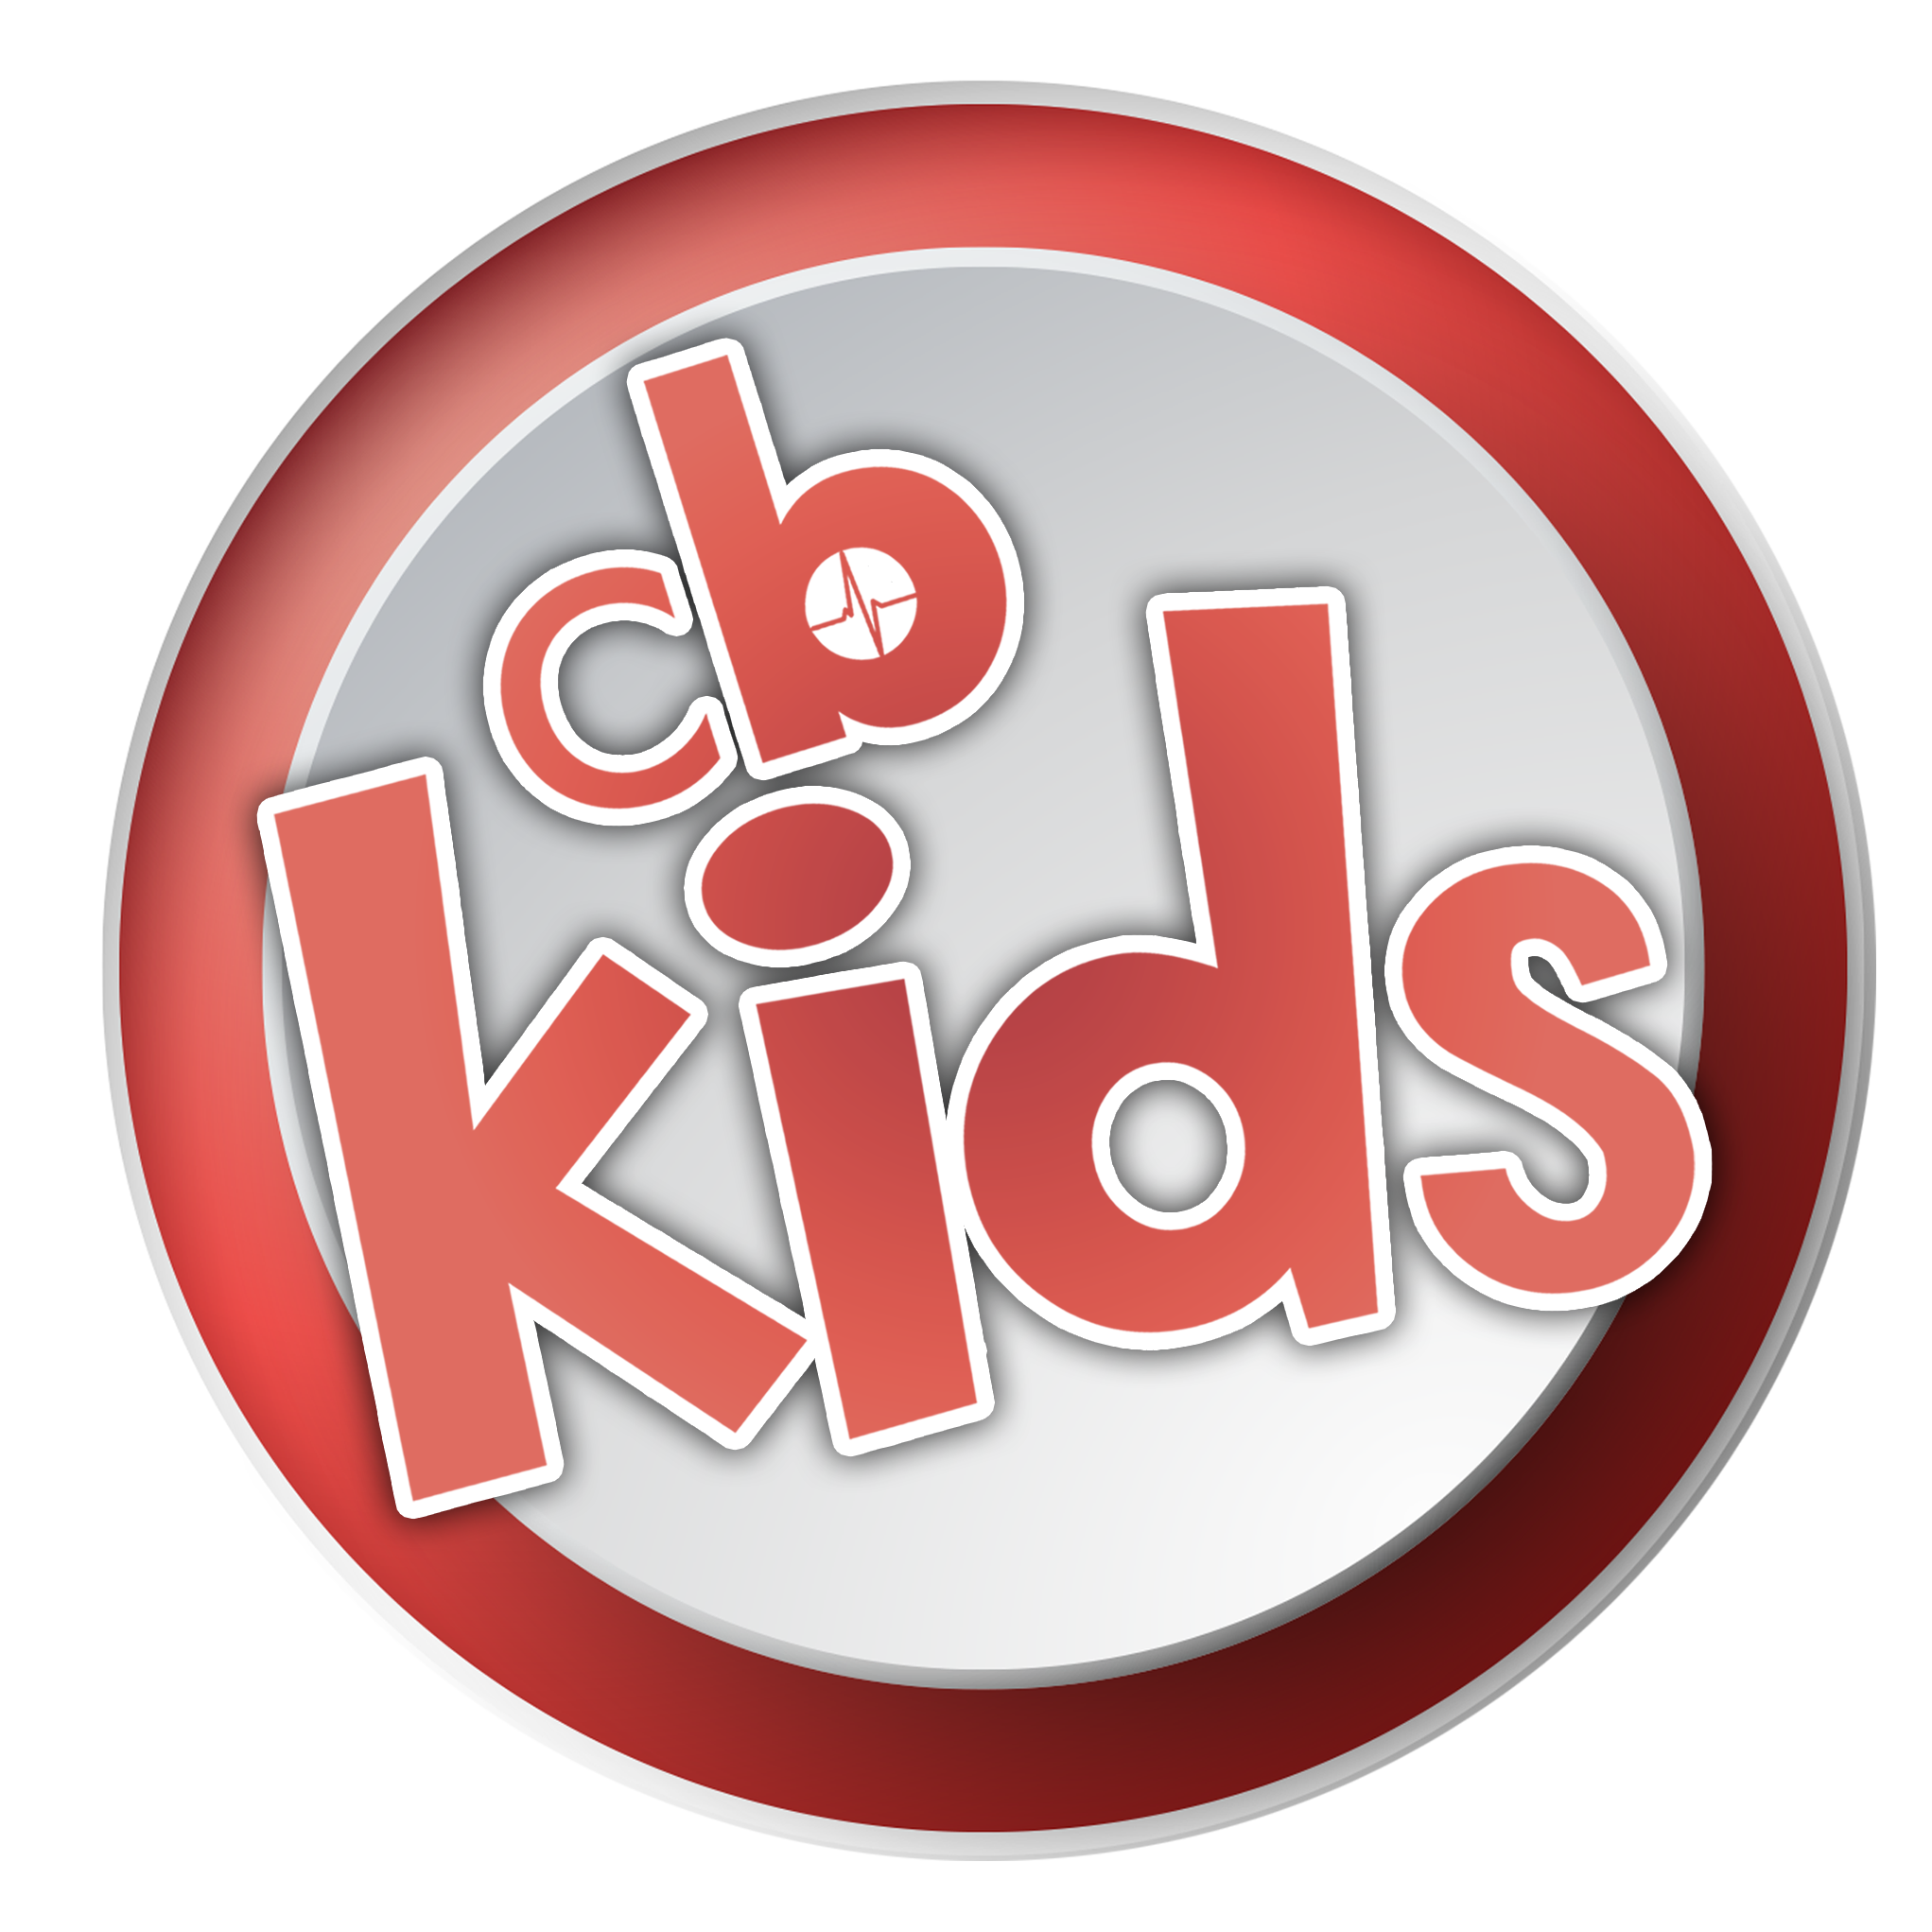 cb_rebrandkids.png